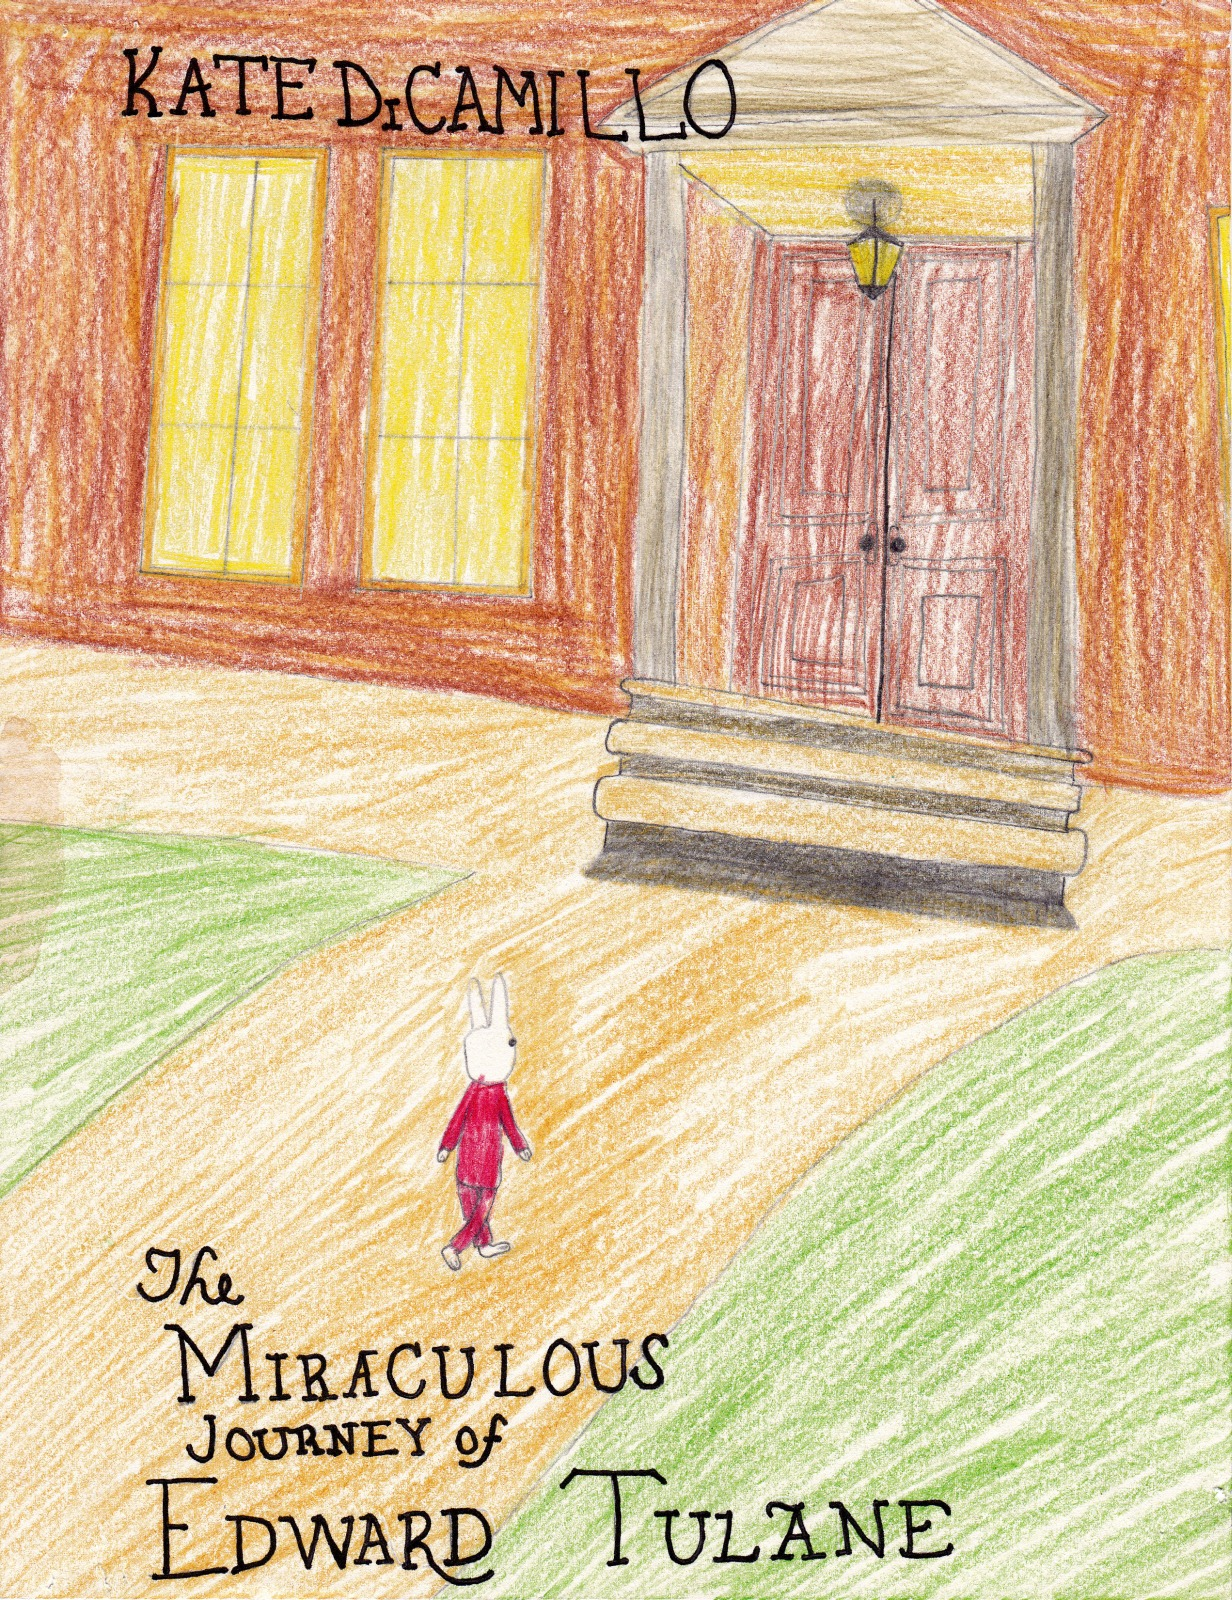 Miraculous Journey of Edward Tulane, artwork by Meiwan Gottschalk